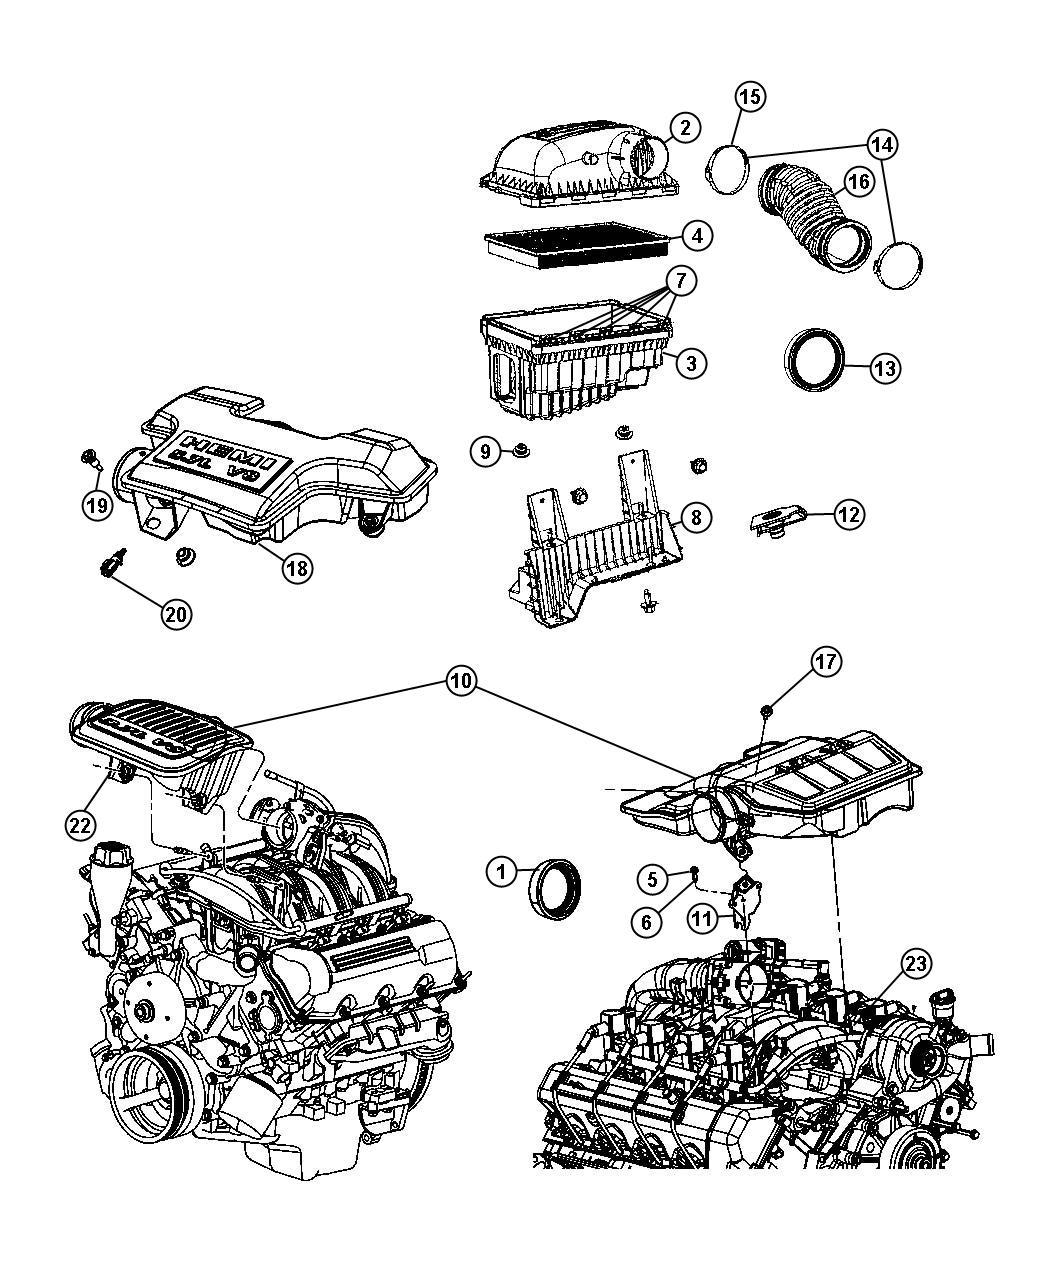 Dodge Ram Resonator Throttle Body Upper Engine